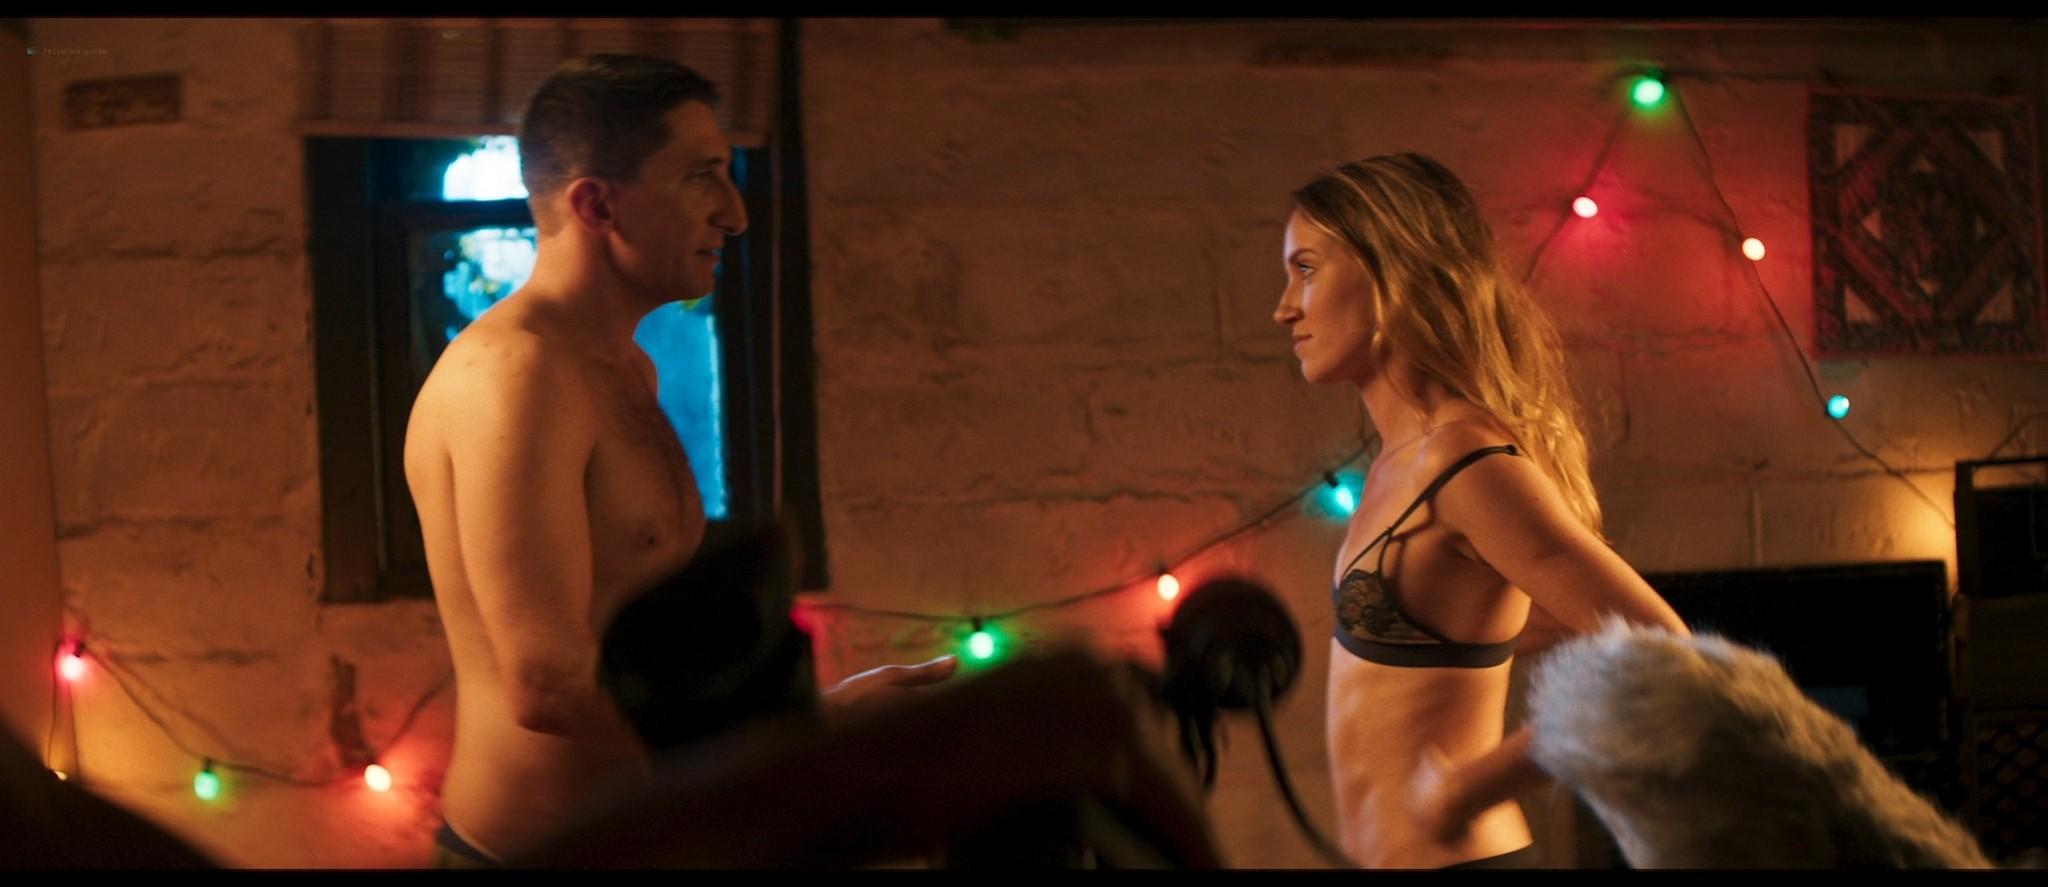 Ellen Toland nude topless Katie Claire McGrath sex doggy style - Inside the Rain (2019) HD 1080p Web (7)